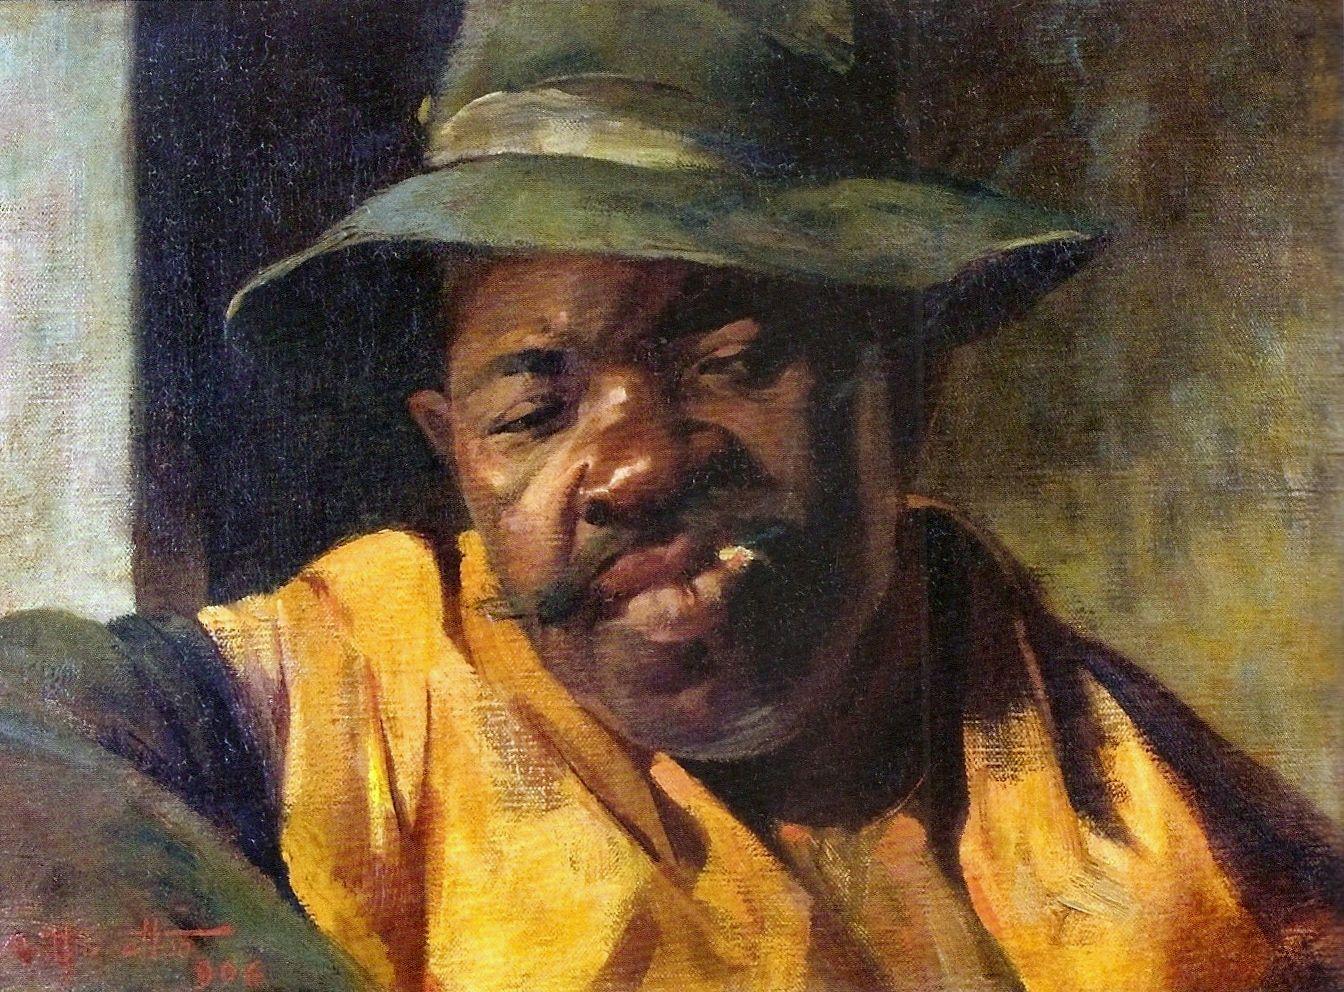 Artur Timóteo da Costa - Retrato de Negro